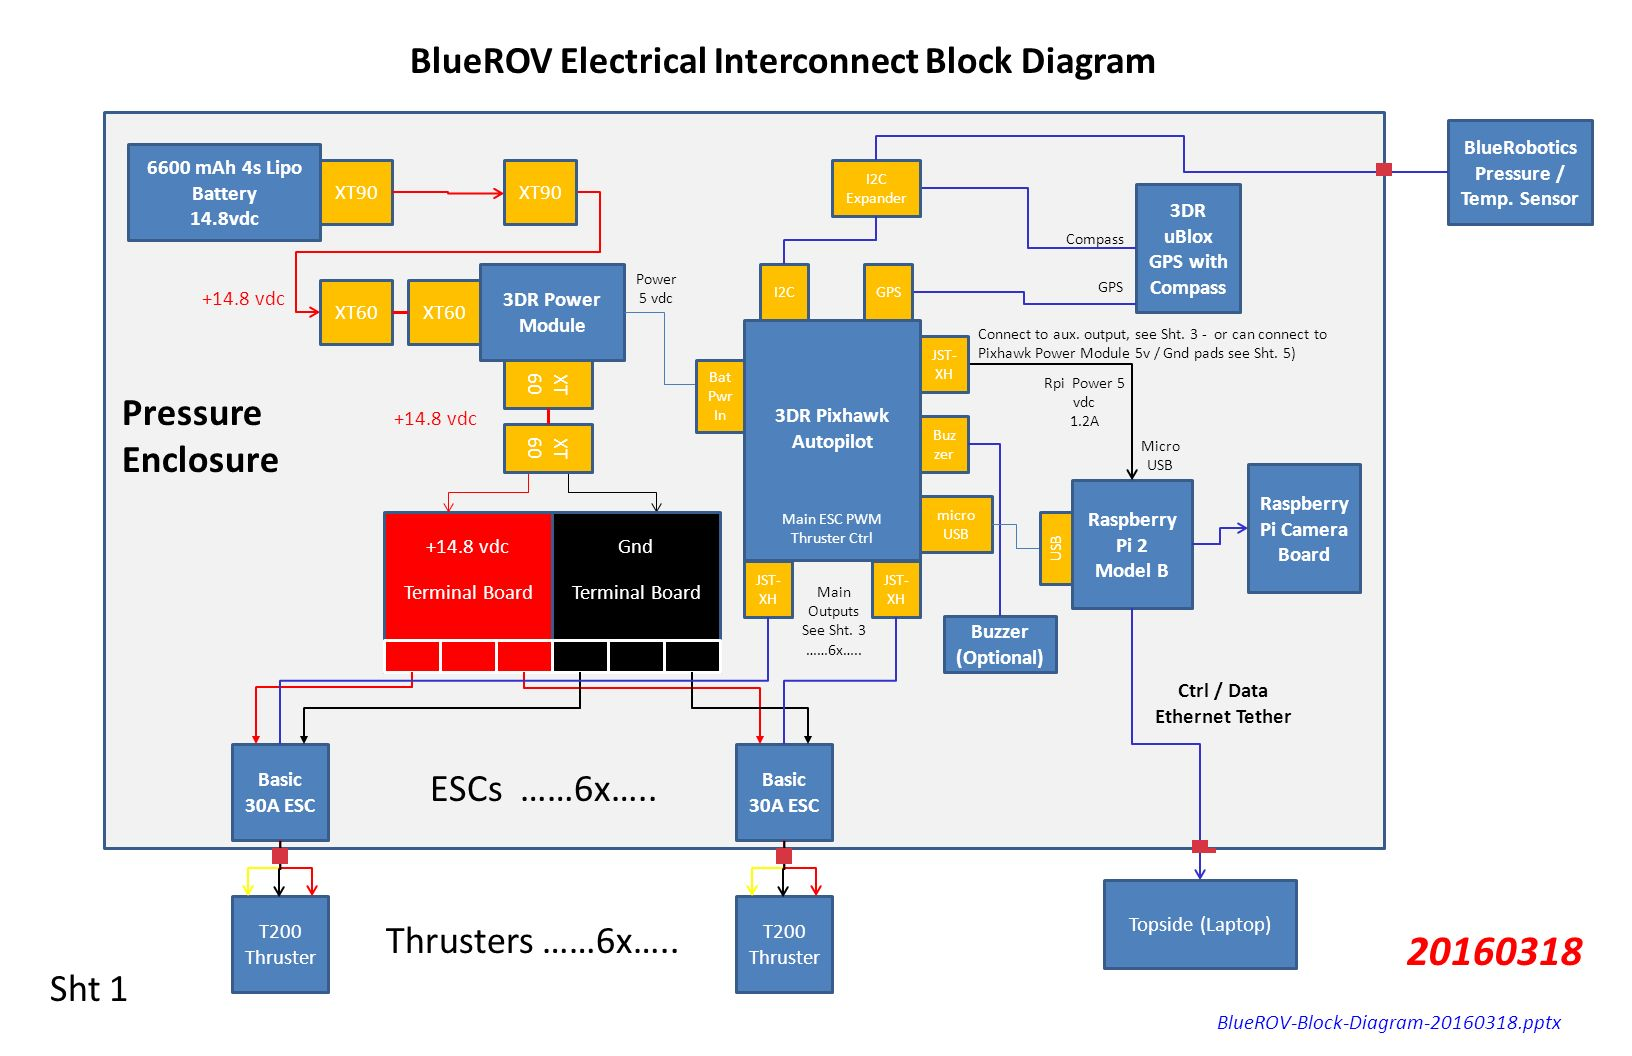 Bluerov electrical interconnect block diagram ppt video online 20160318 bluerov electrical interconnect block diagram pooptronica